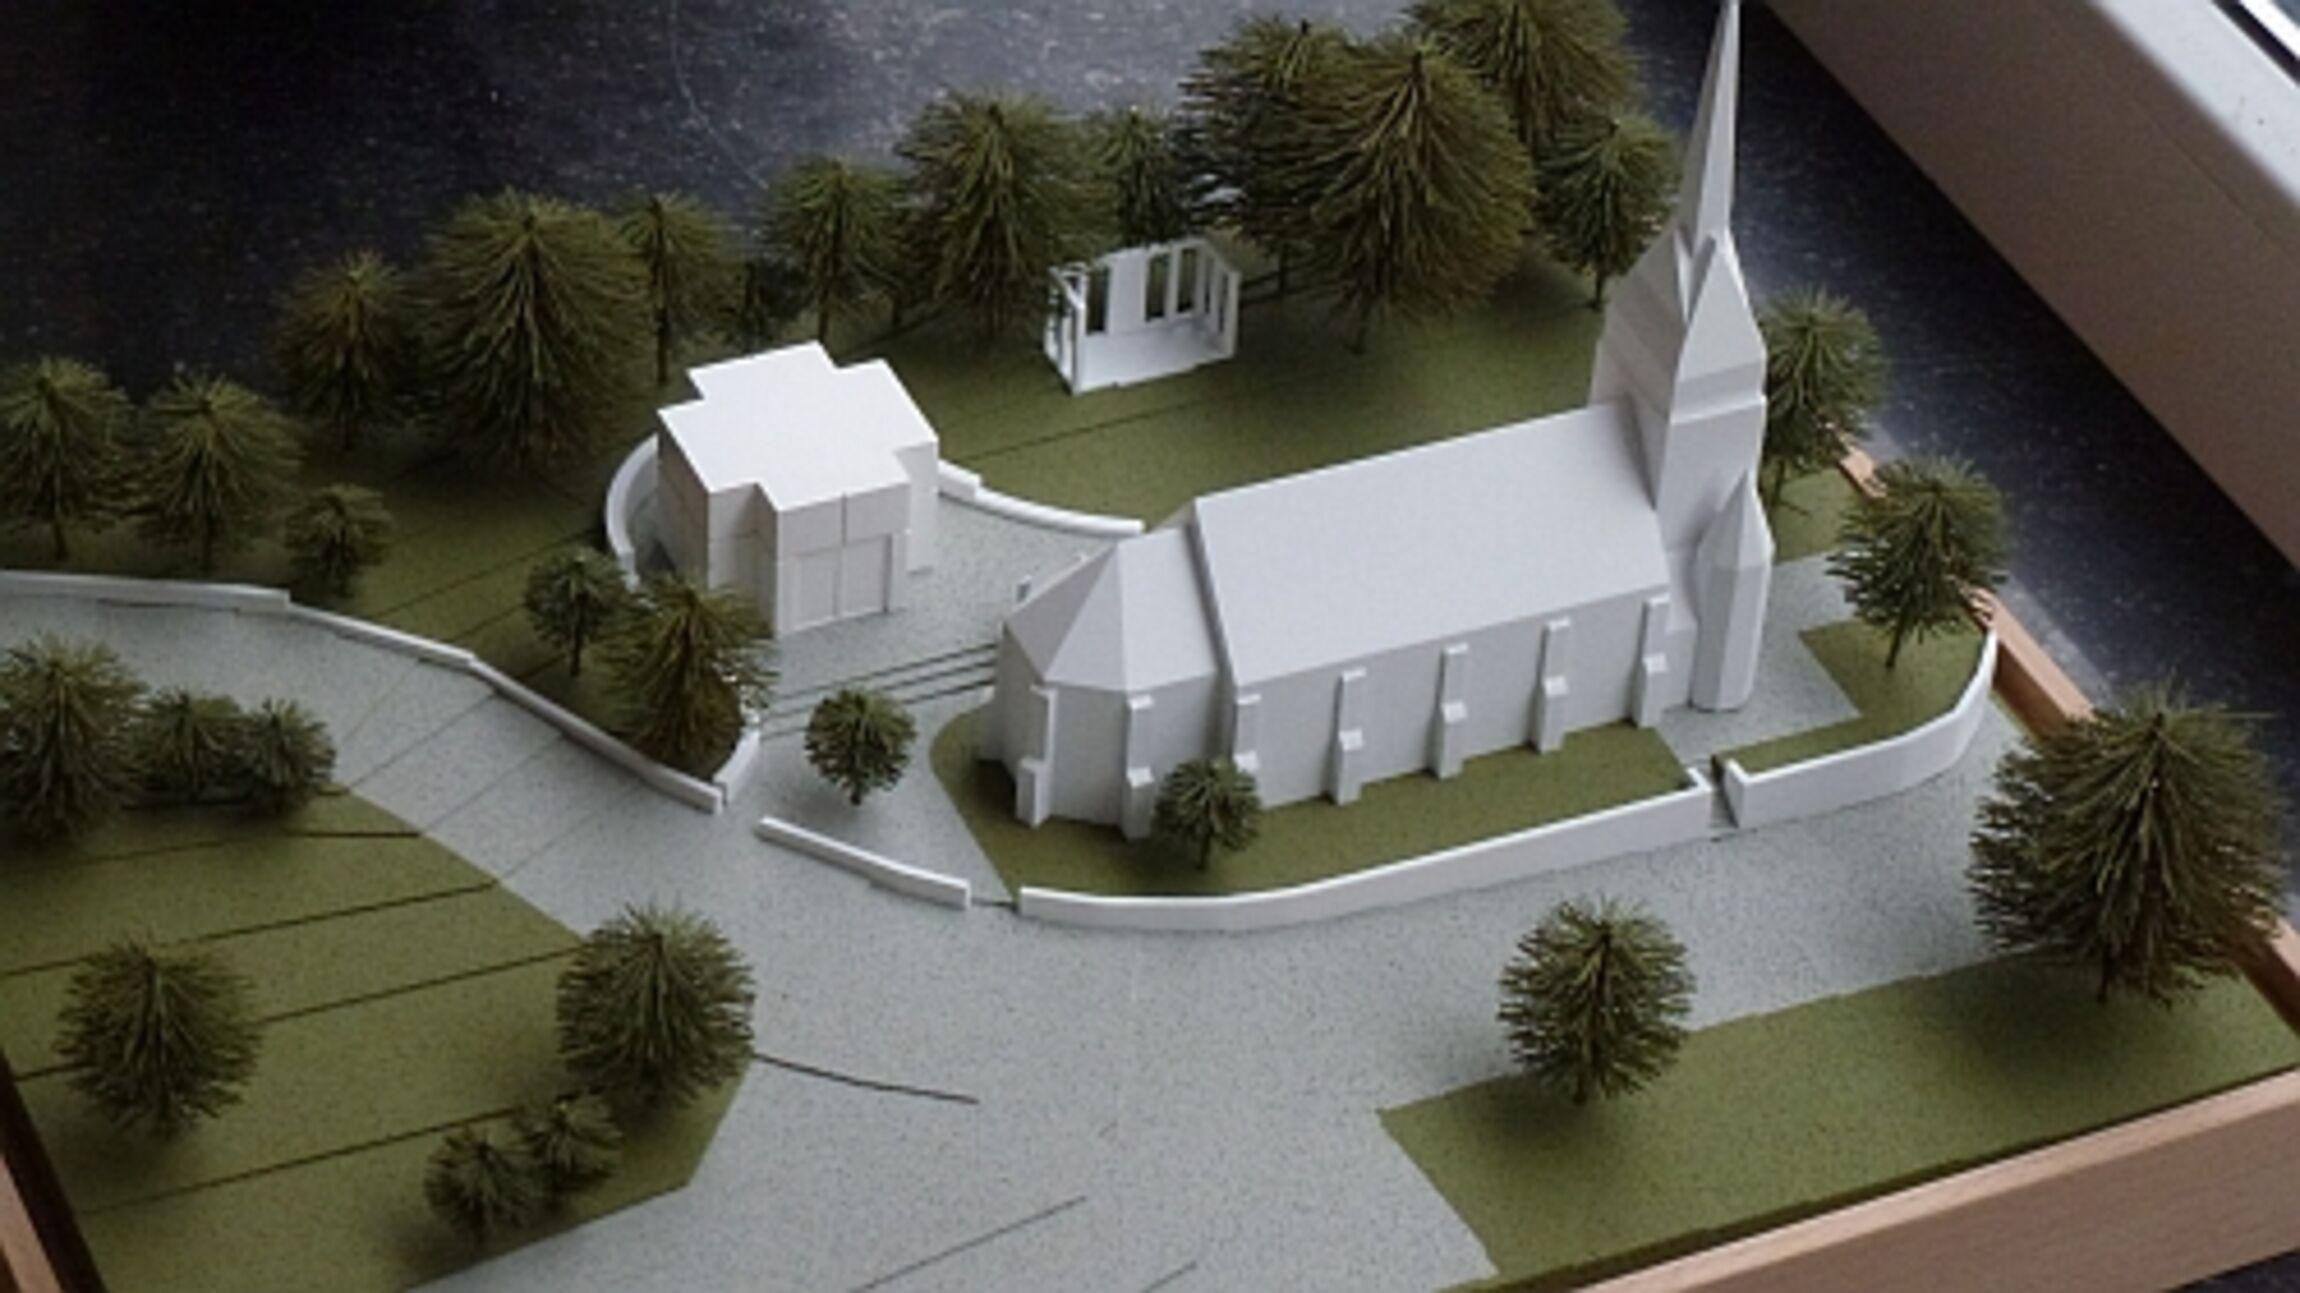 Modell des Kolumbariums St. Ludgeri -Ehmen